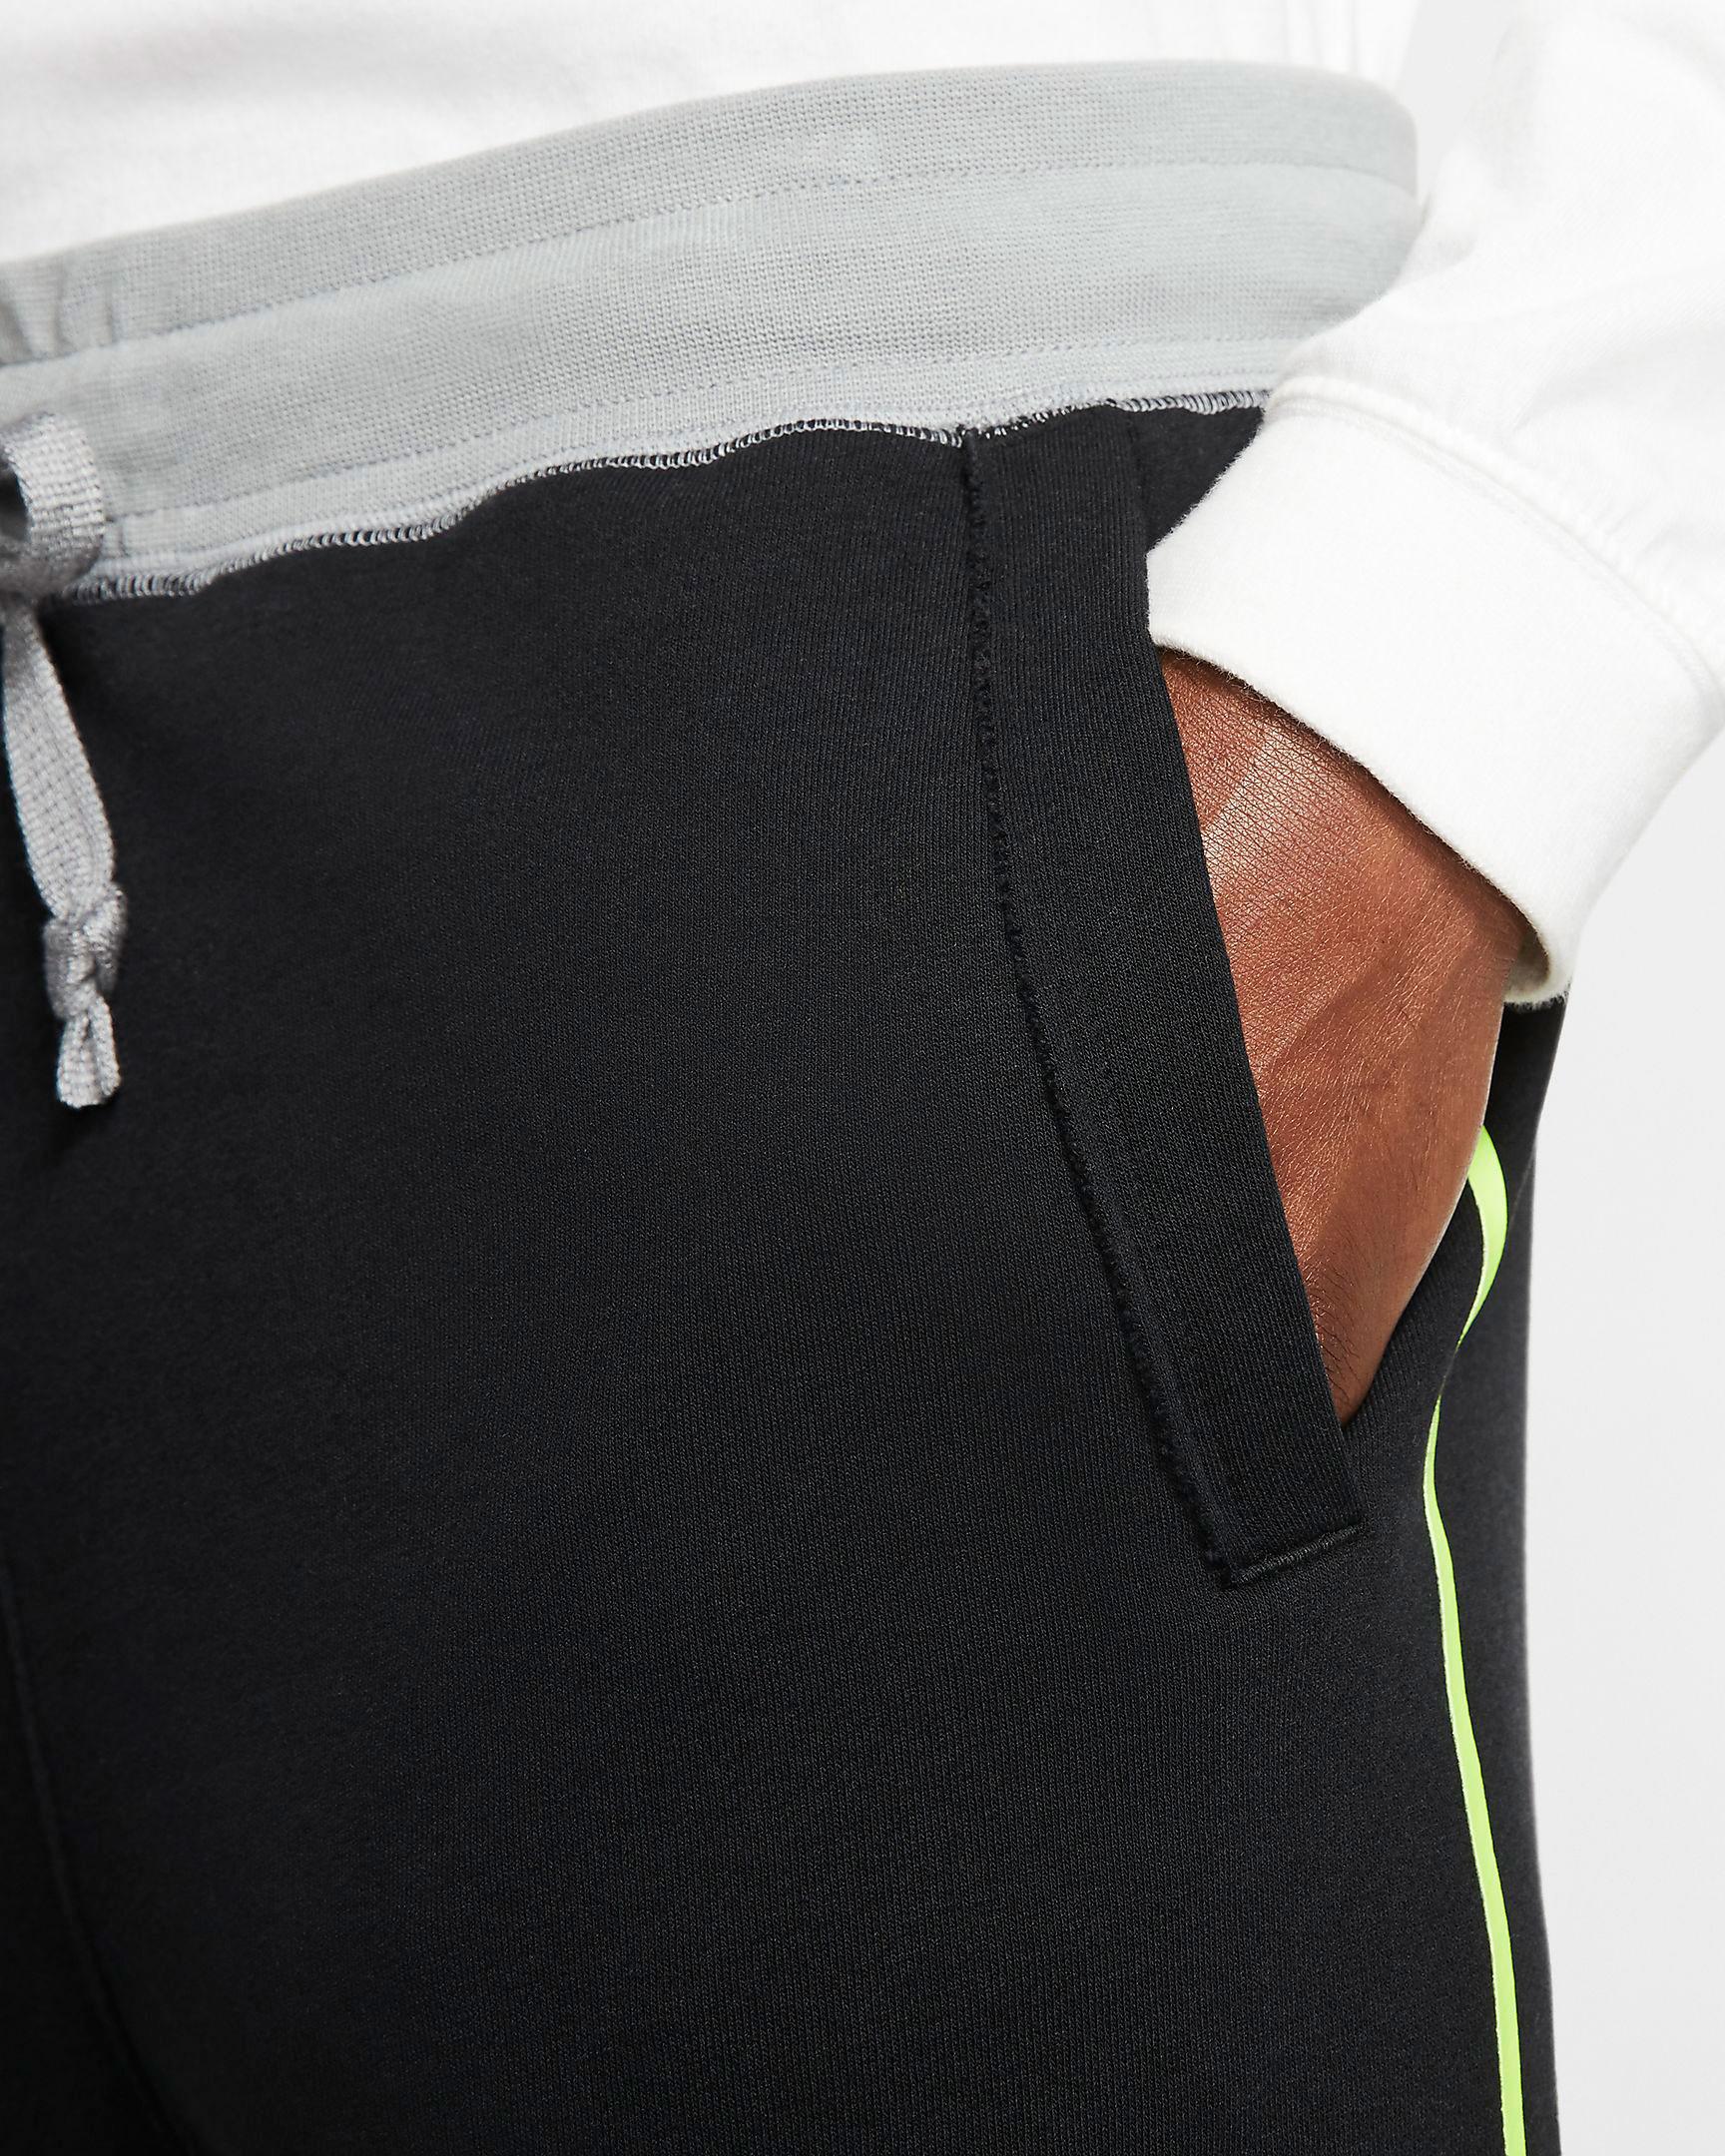 air-jordan-4-neon-nike-black-volt-shorts-2